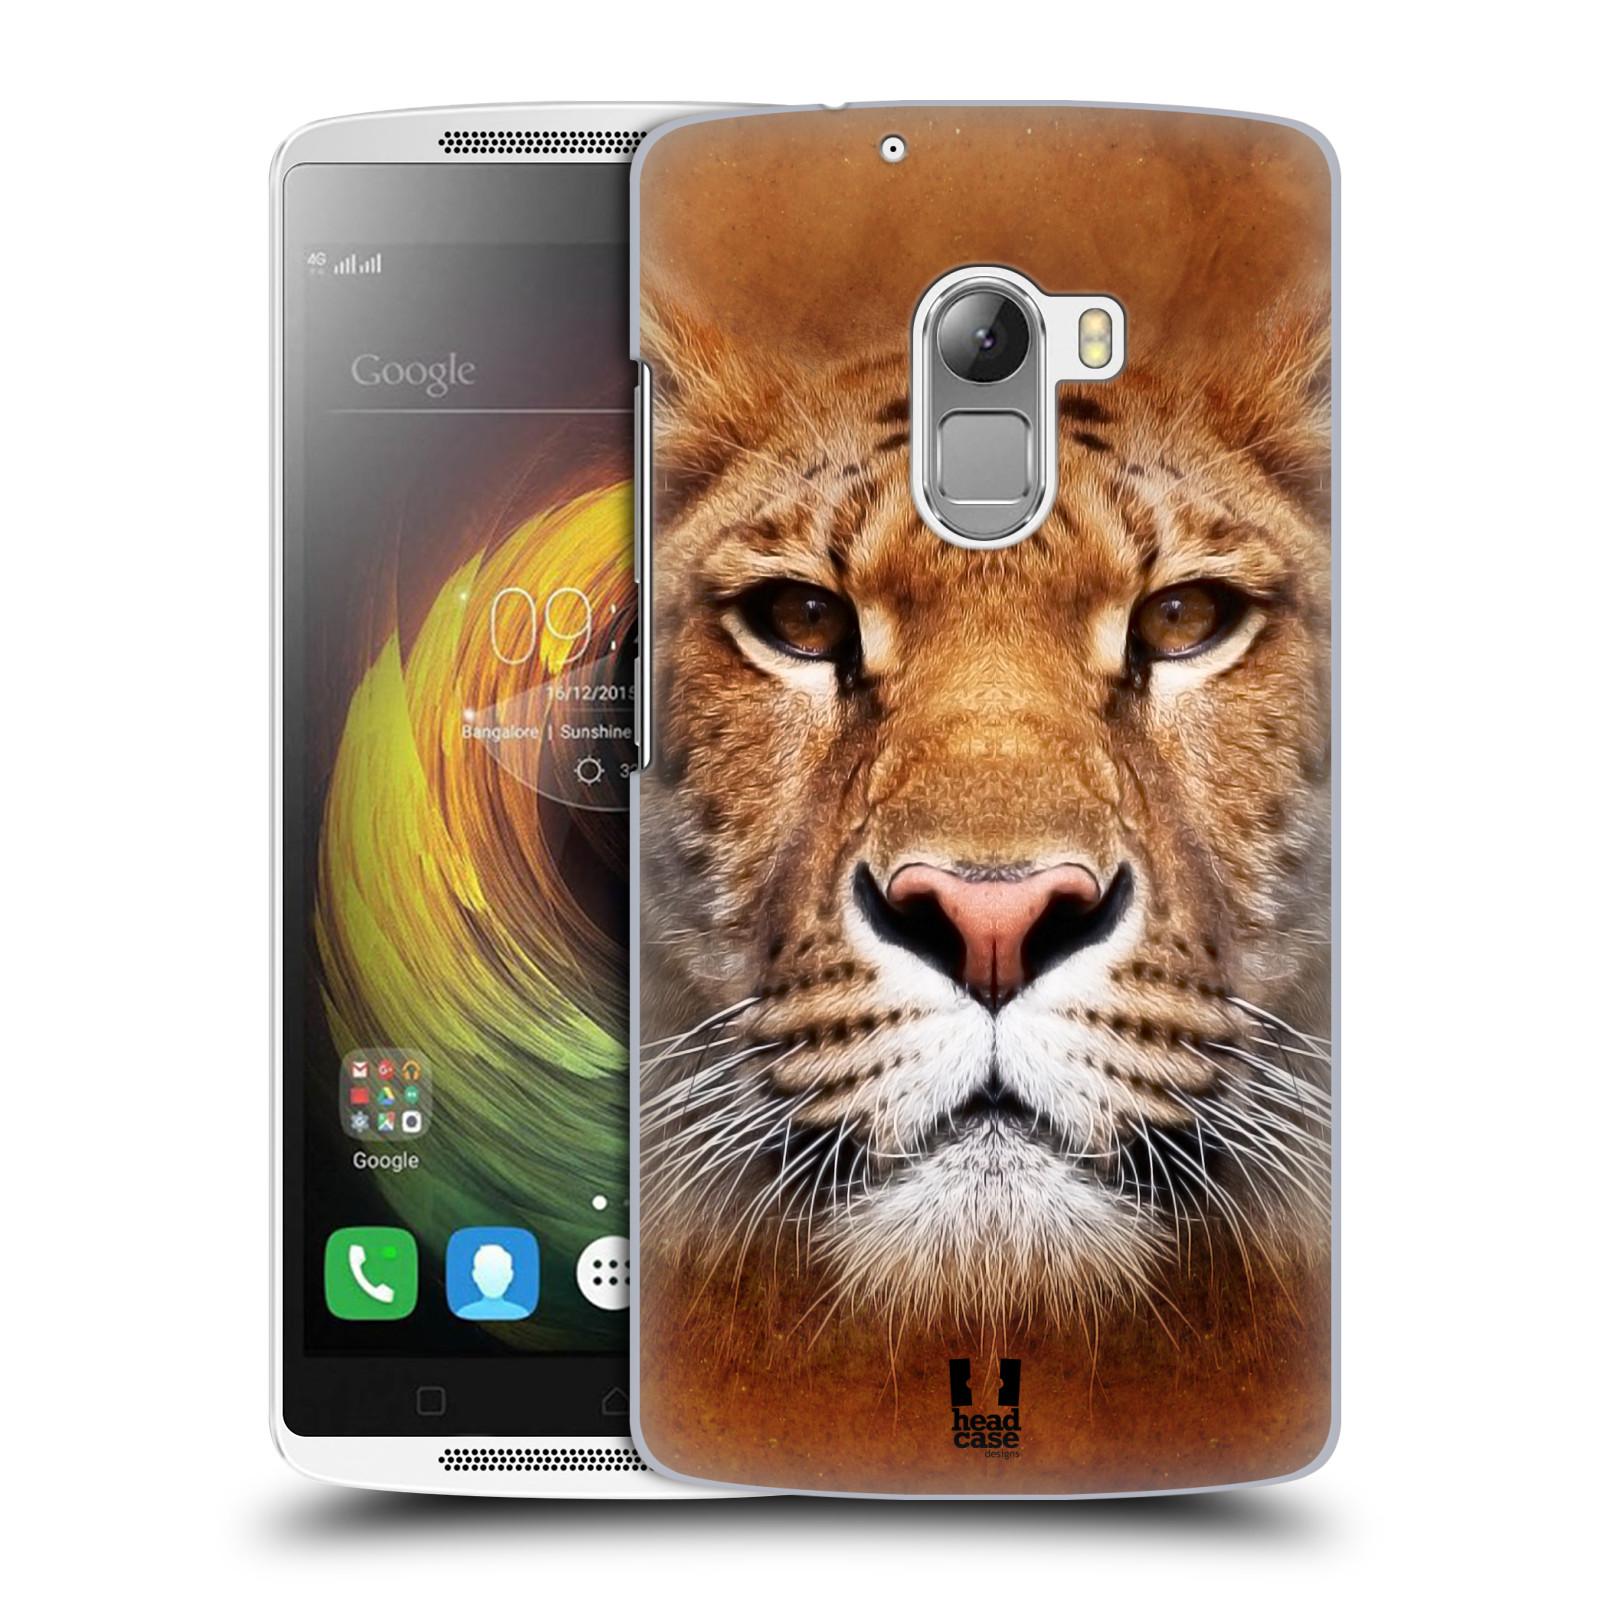 HEAD CASE pevný plastový obal na mobil LENOVO A7010 / A7010 DUAL / K4 Note / Vibe X3 lite vzor Zvířecí tváře Sibiřský tygr